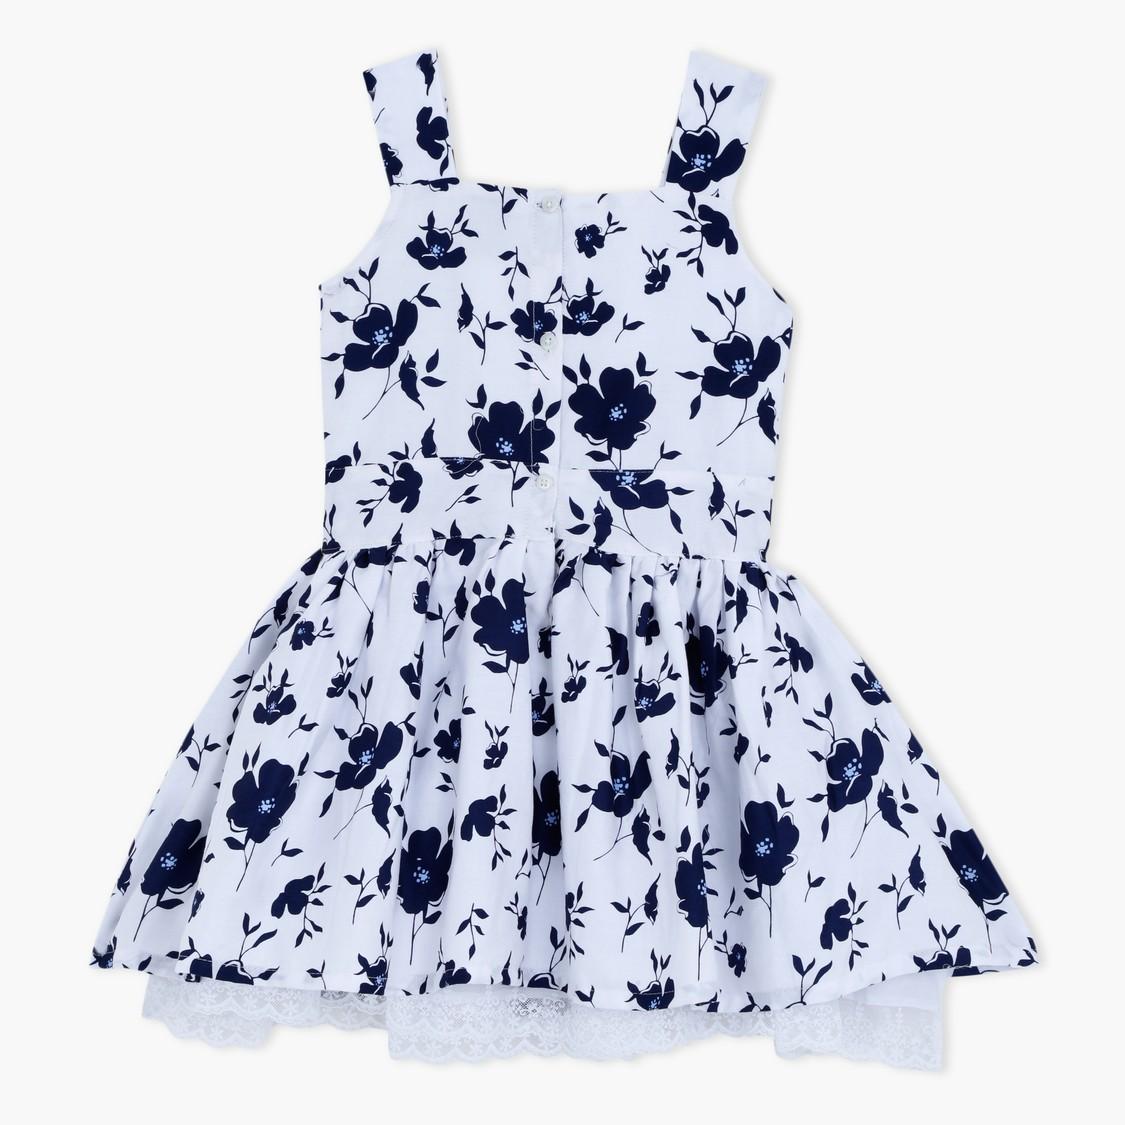 Floral Print Sleeveless Dress with Lace Hem